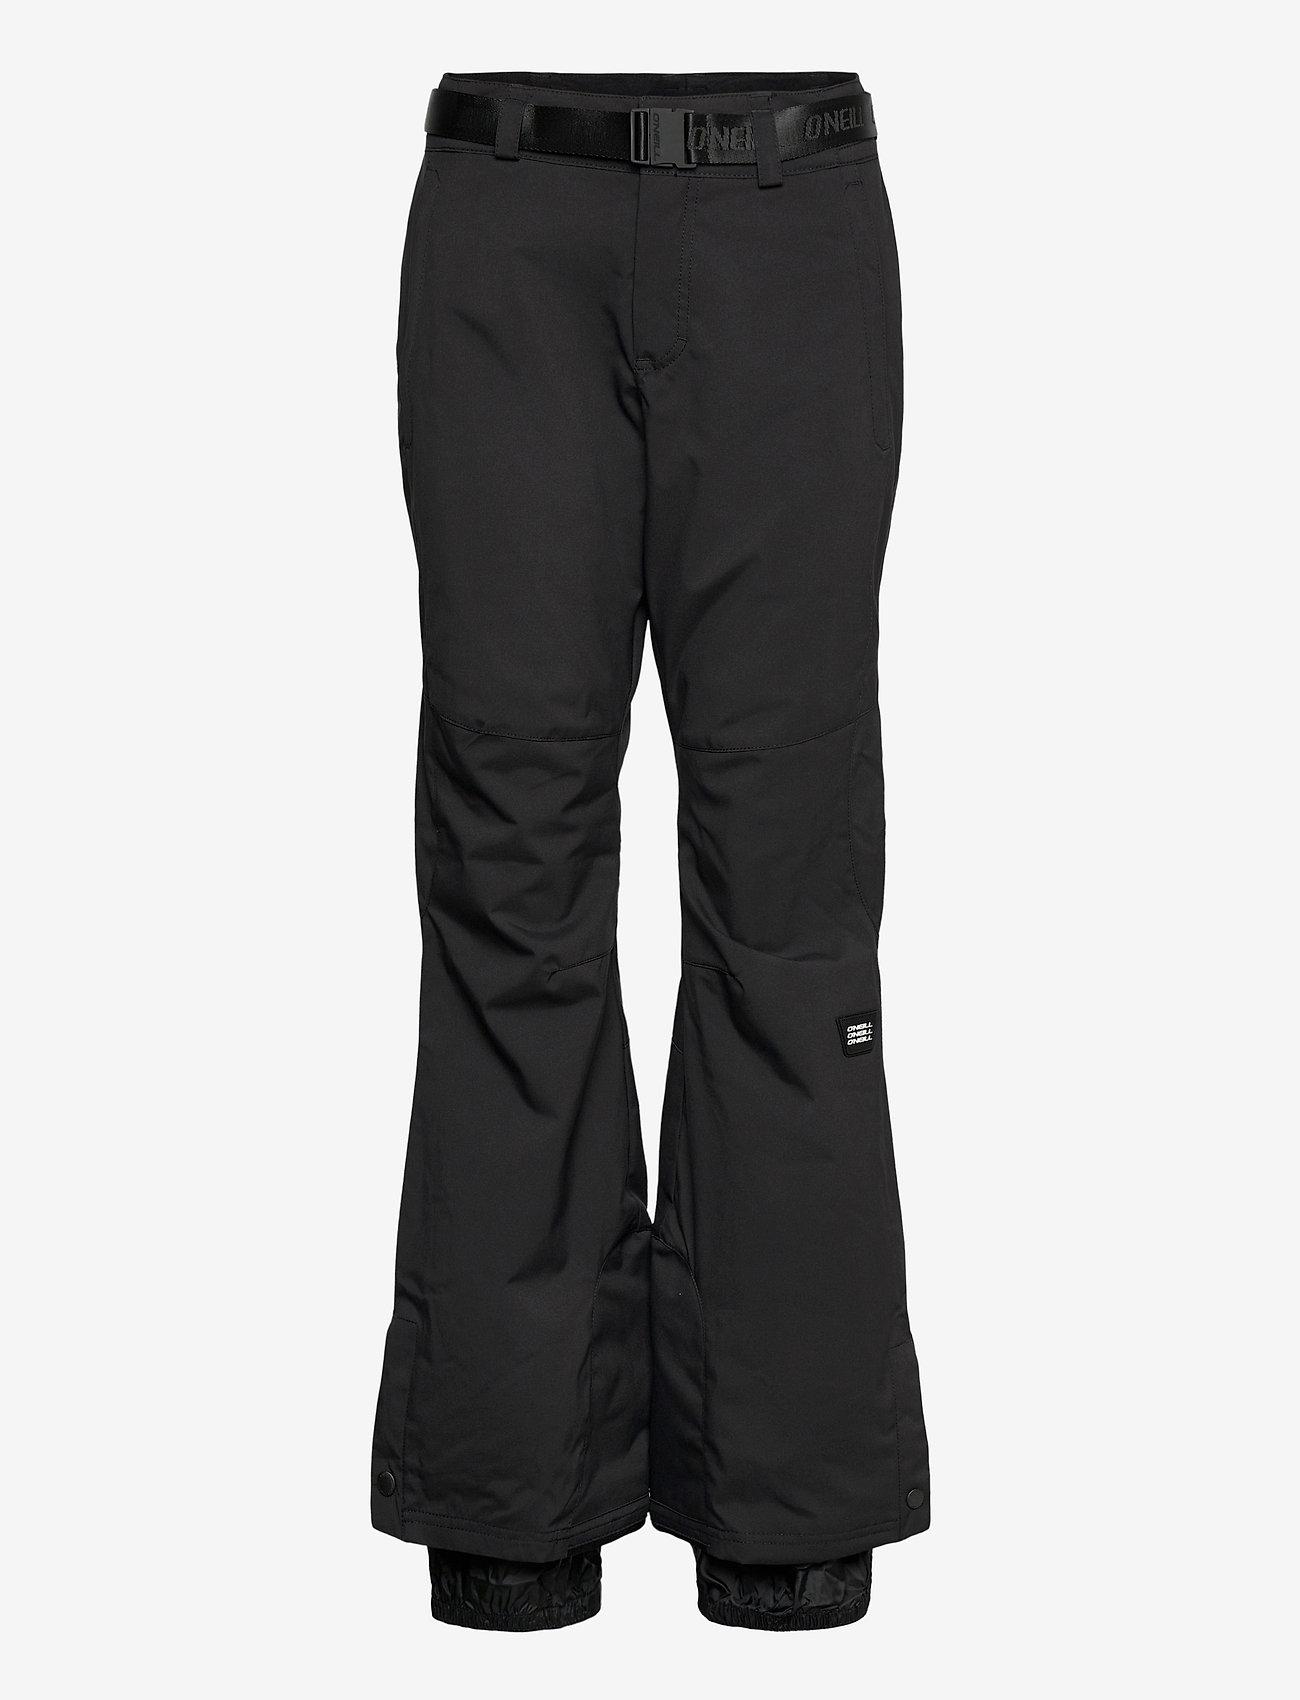 O'Neill - PW STAR SLIM PANTS - skibroeken - black out - 0